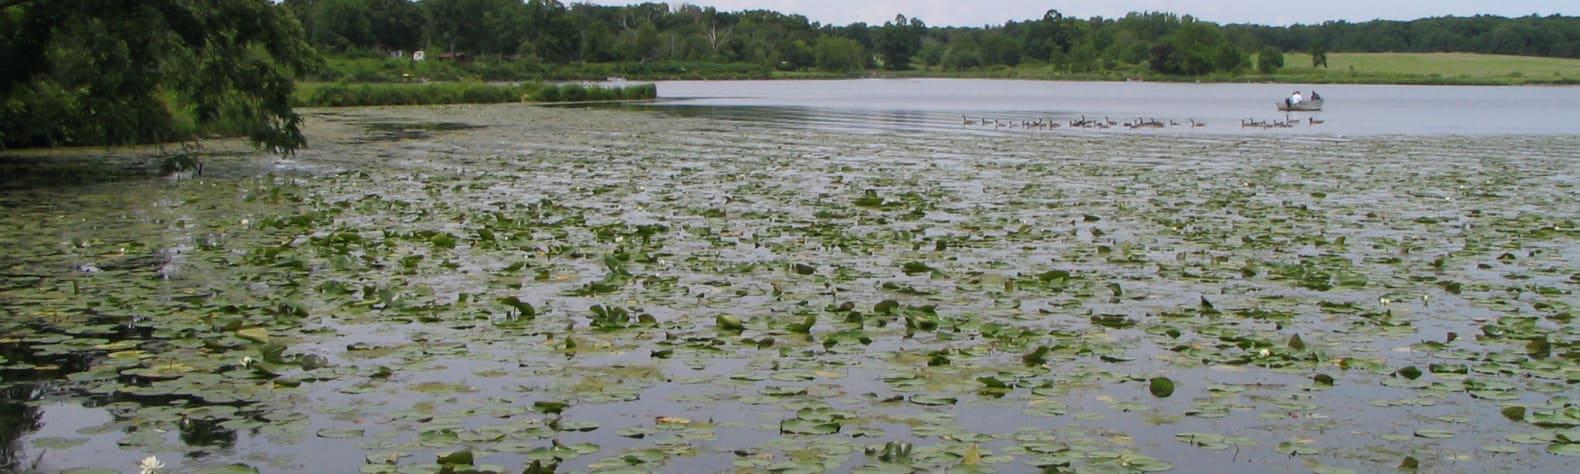 Shabbona Lake State Recreation Area